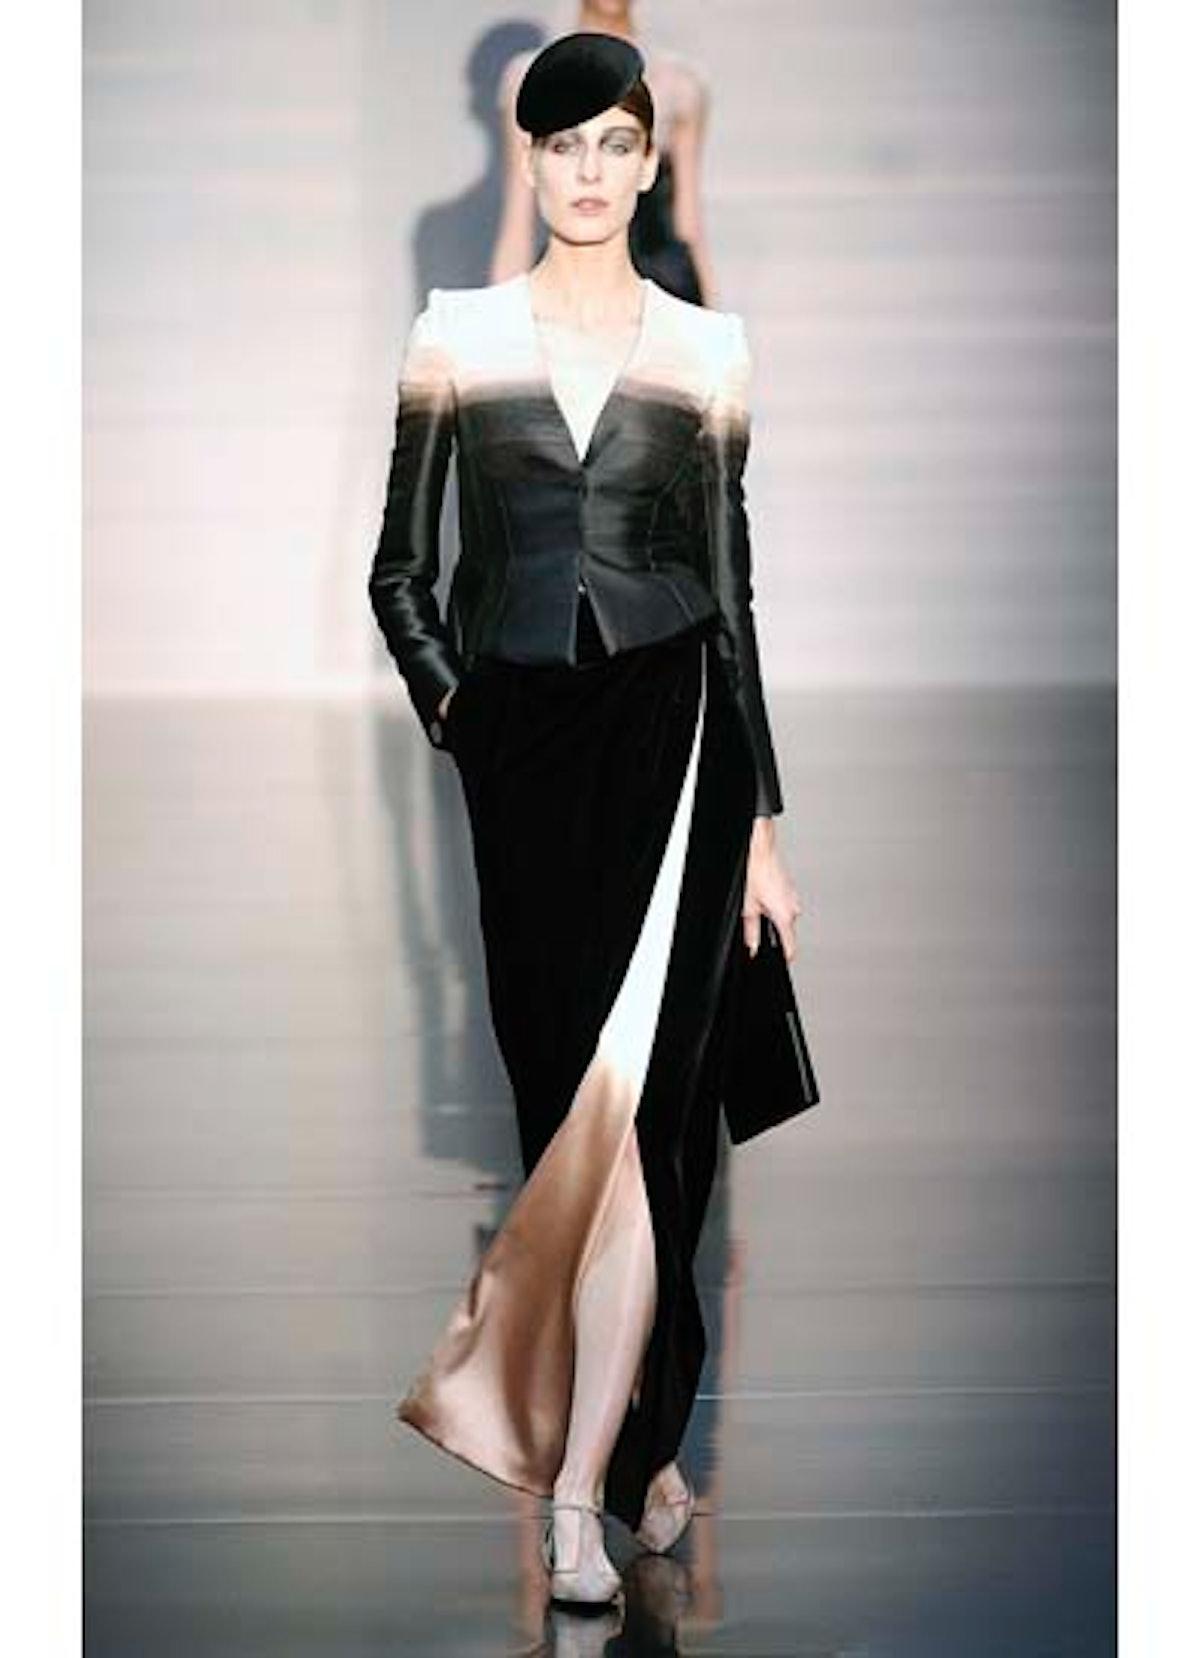 fass-giorgio-armani-couture-2012-runway-09-v.jpg